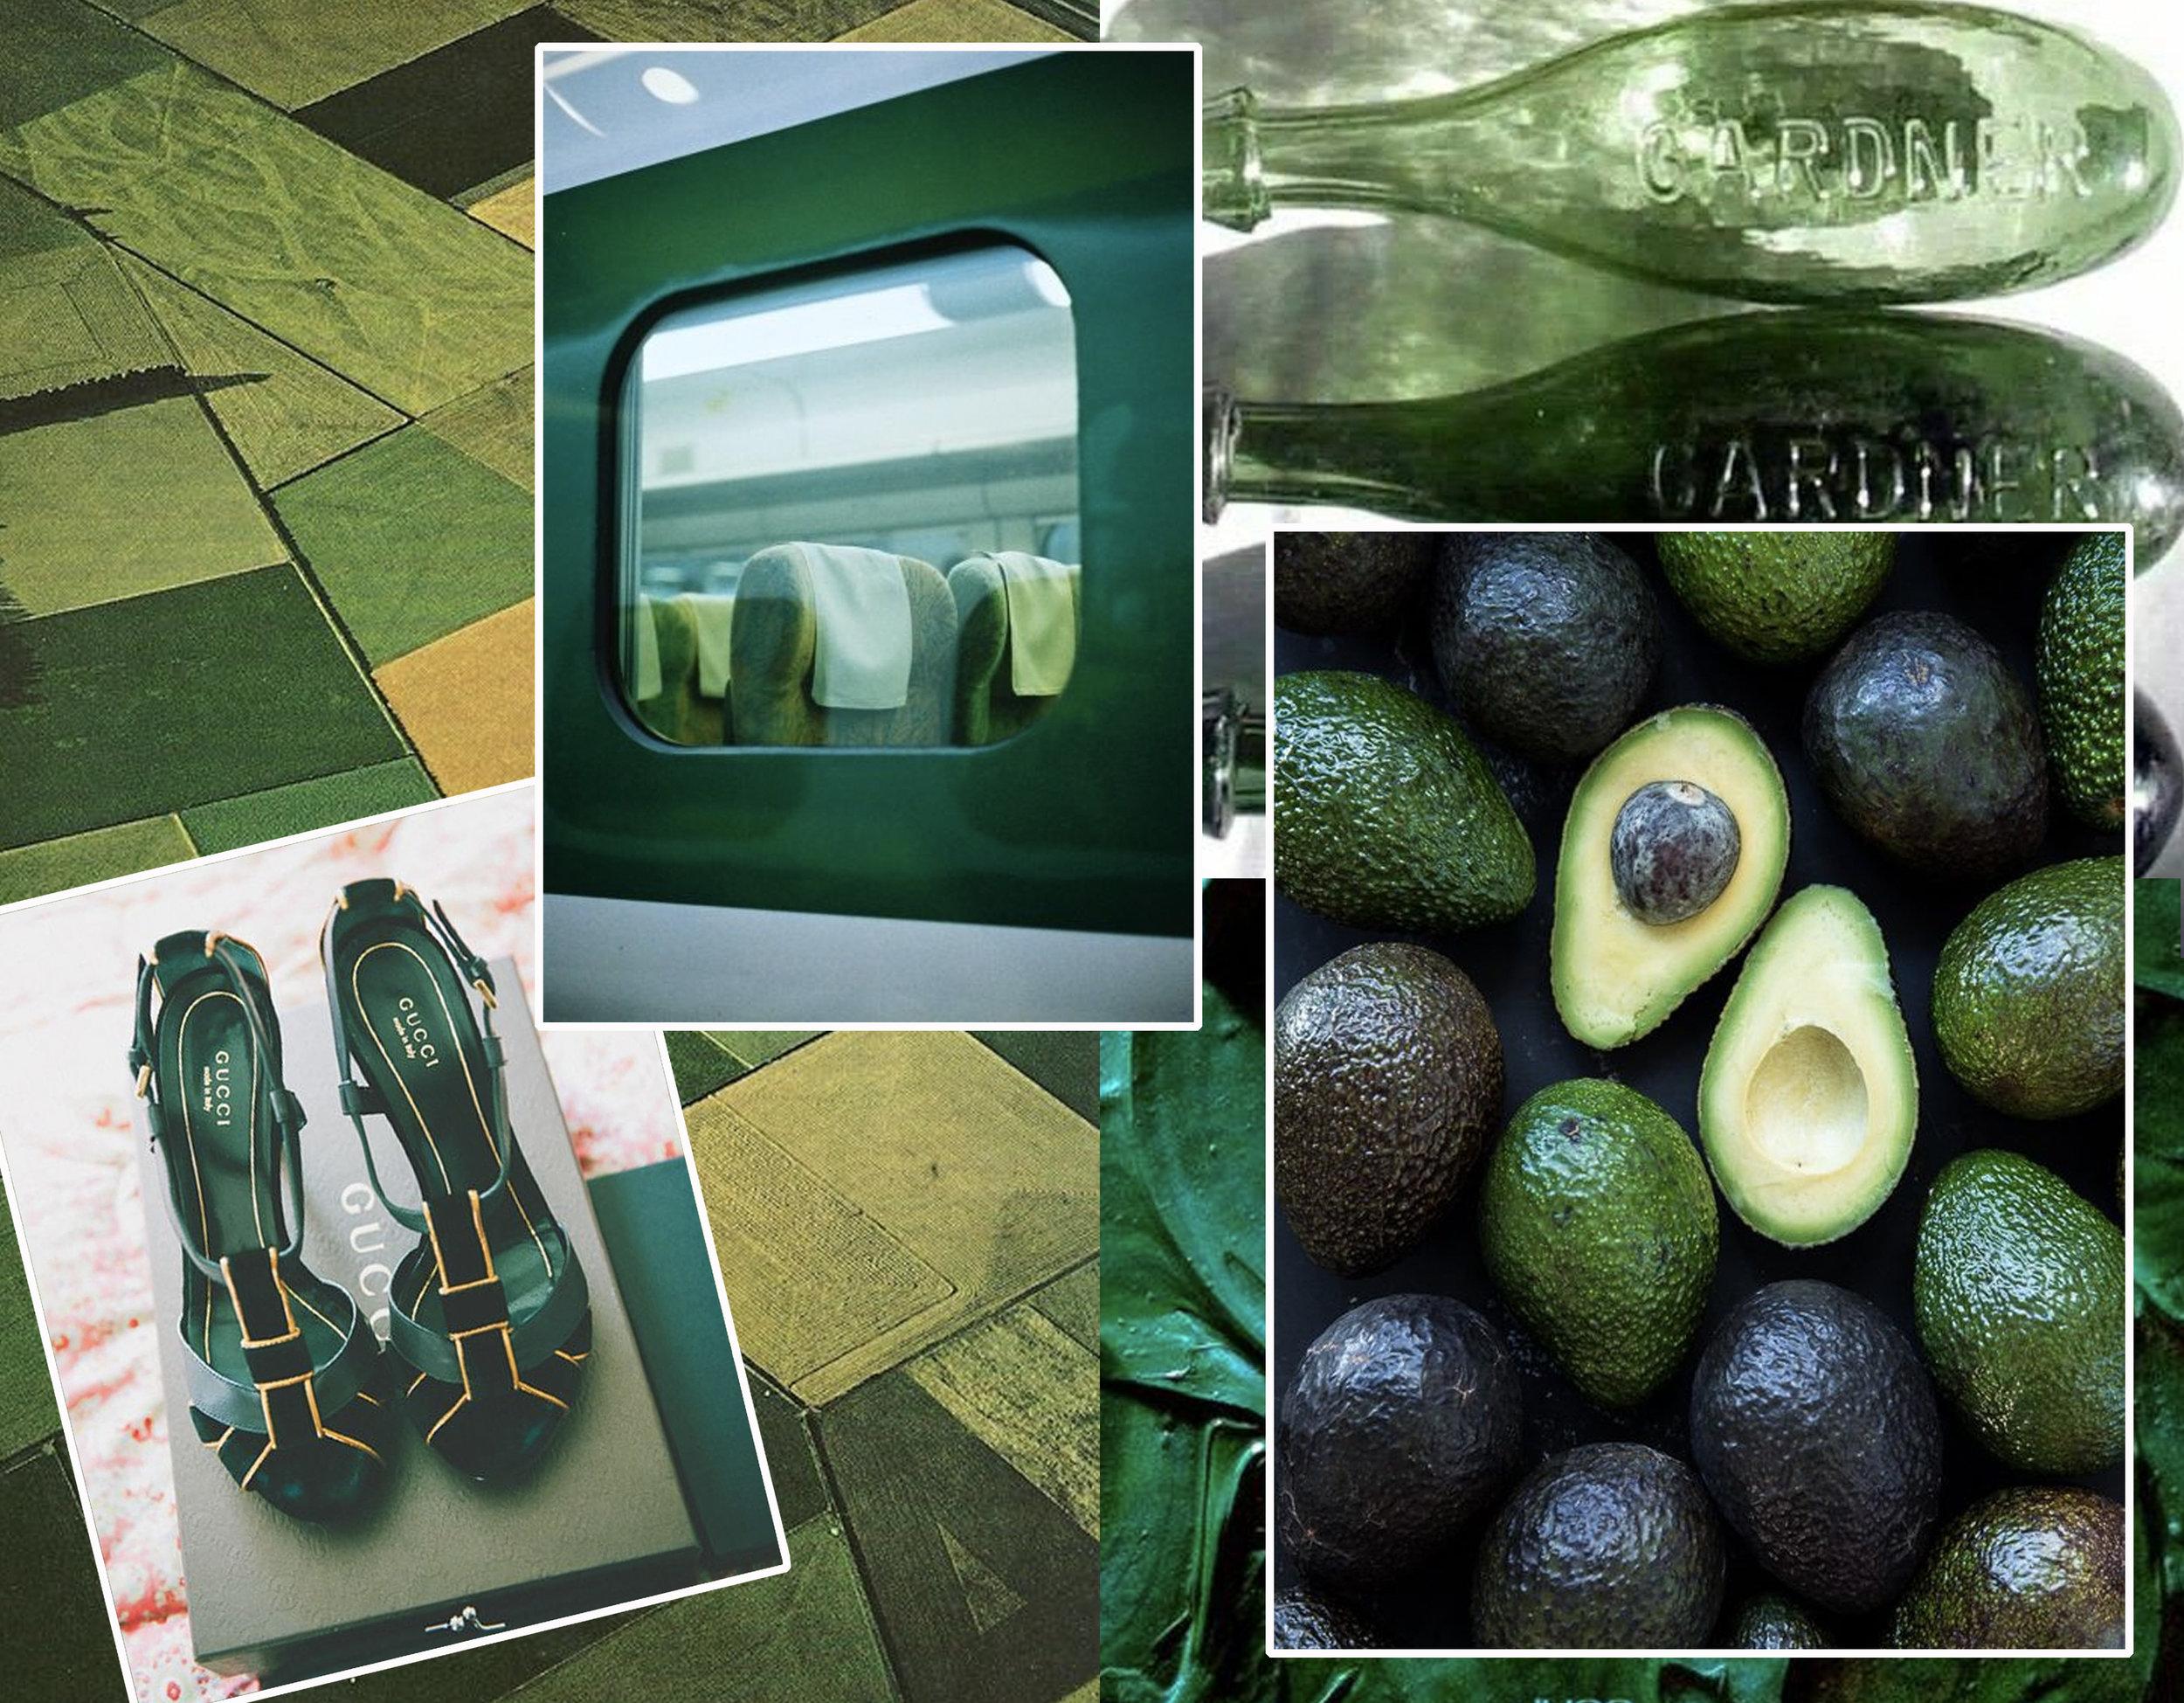 landscape via  Tumblr  - shoes via  Intimate Weddings  - train via  Exercise de Style  - bottles via  NY is my Boyfriend  - avocado via  Nutrition Stripped